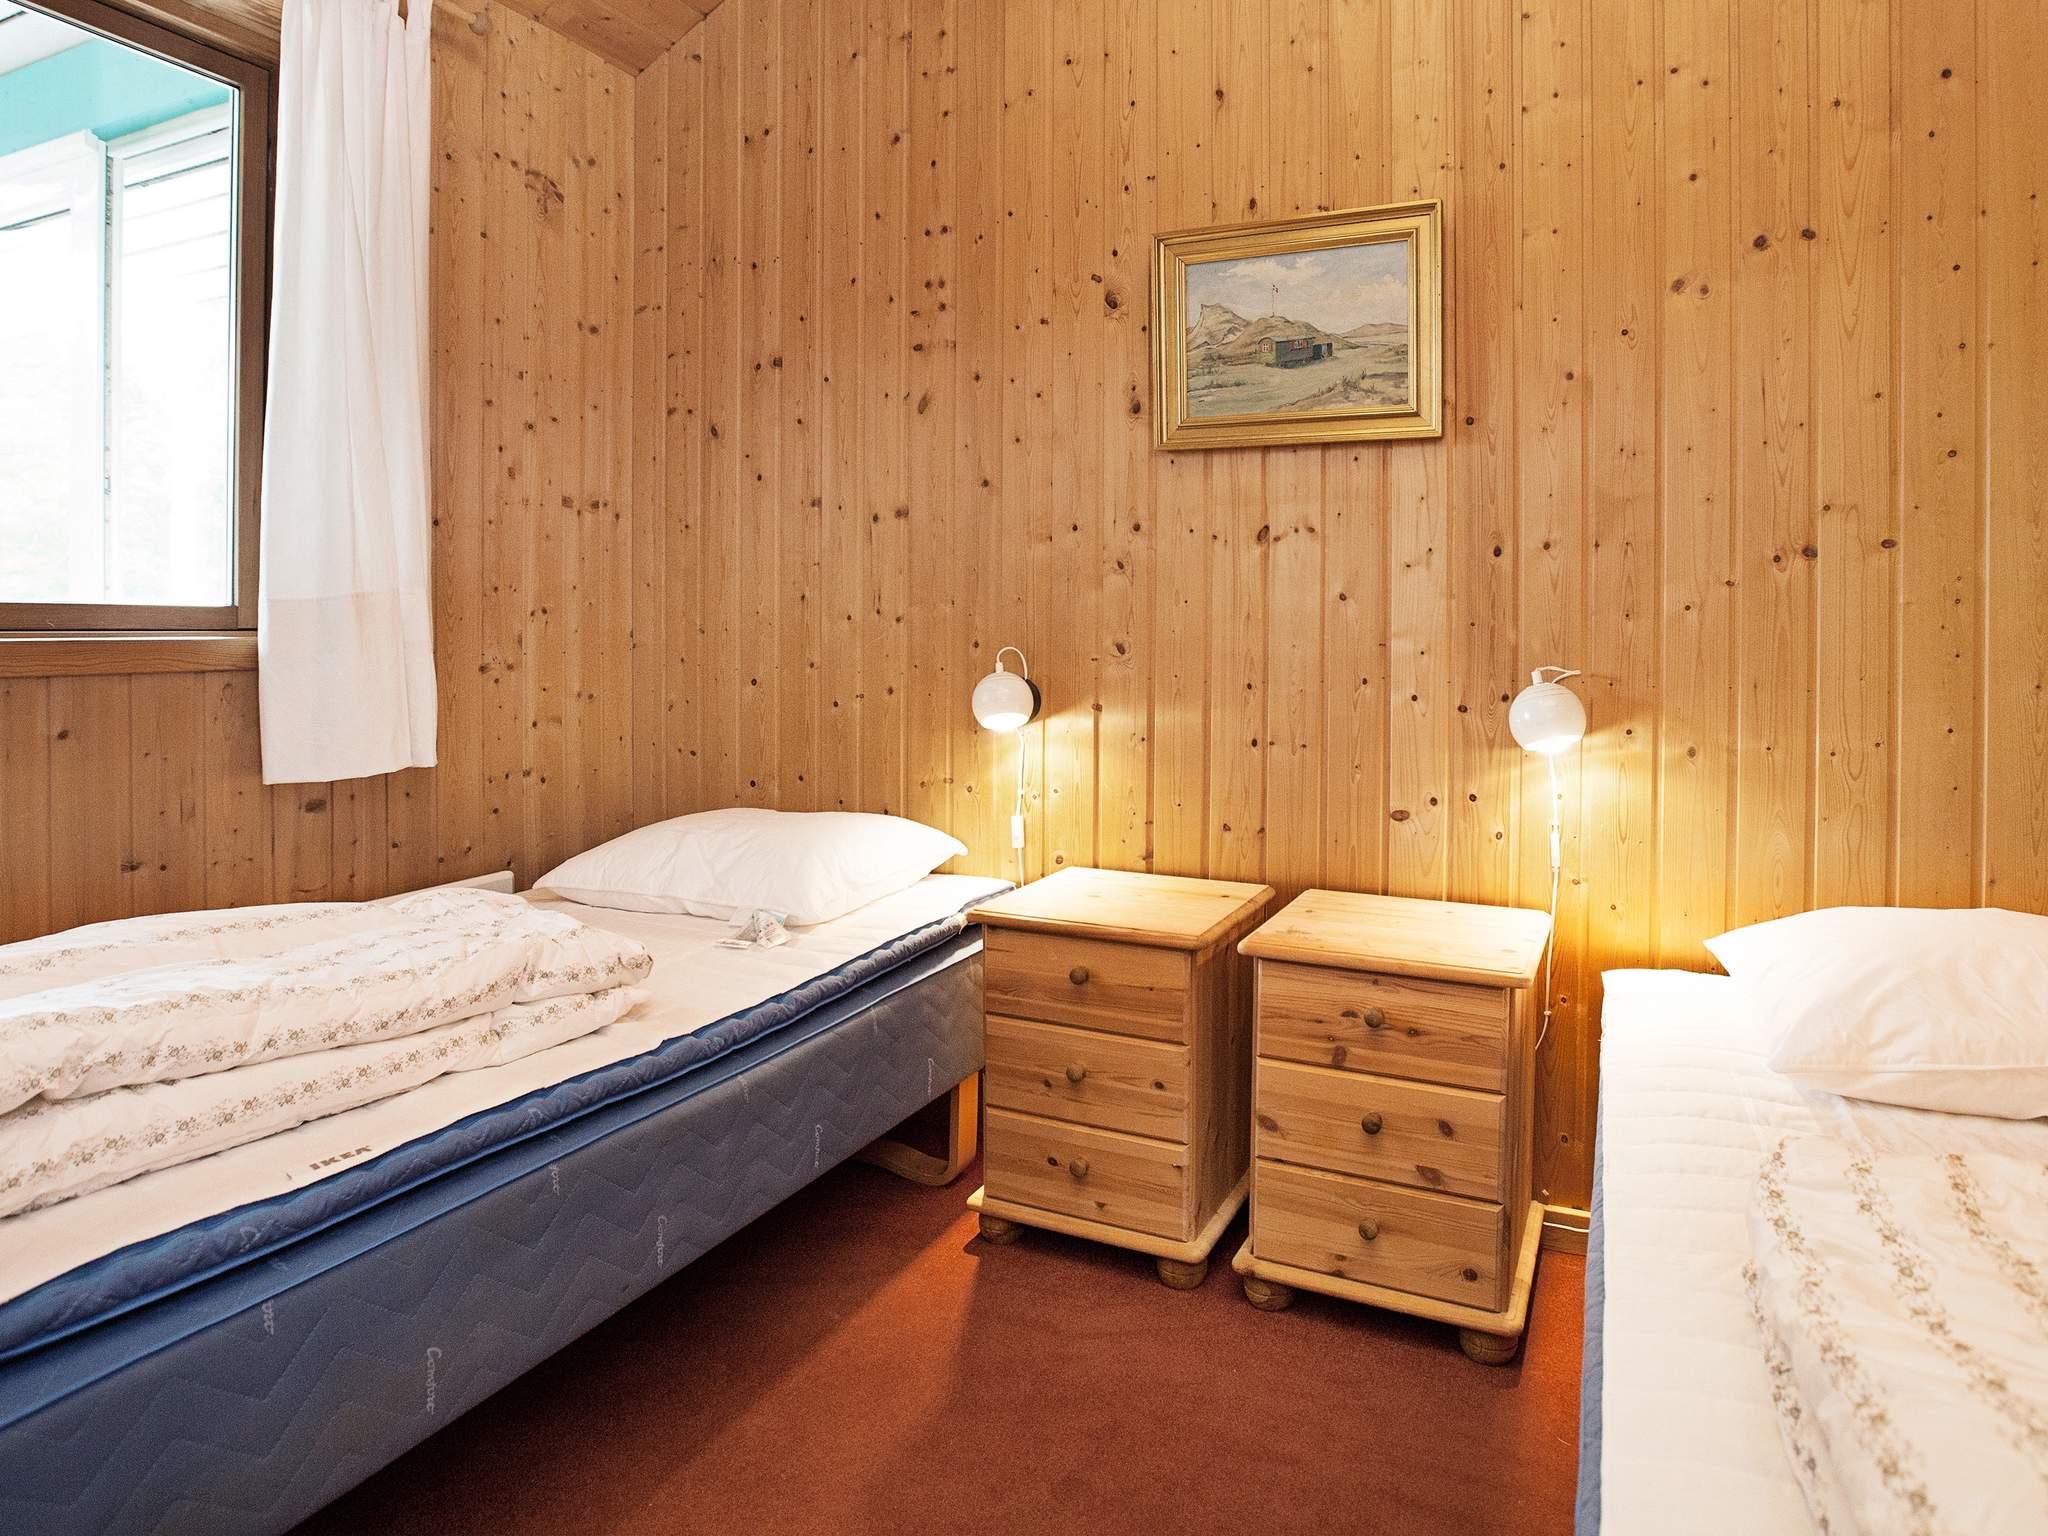 Ferienhaus Skovgårde (86152), Glesborg, , Ostjütland, Dänemark, Bild 11